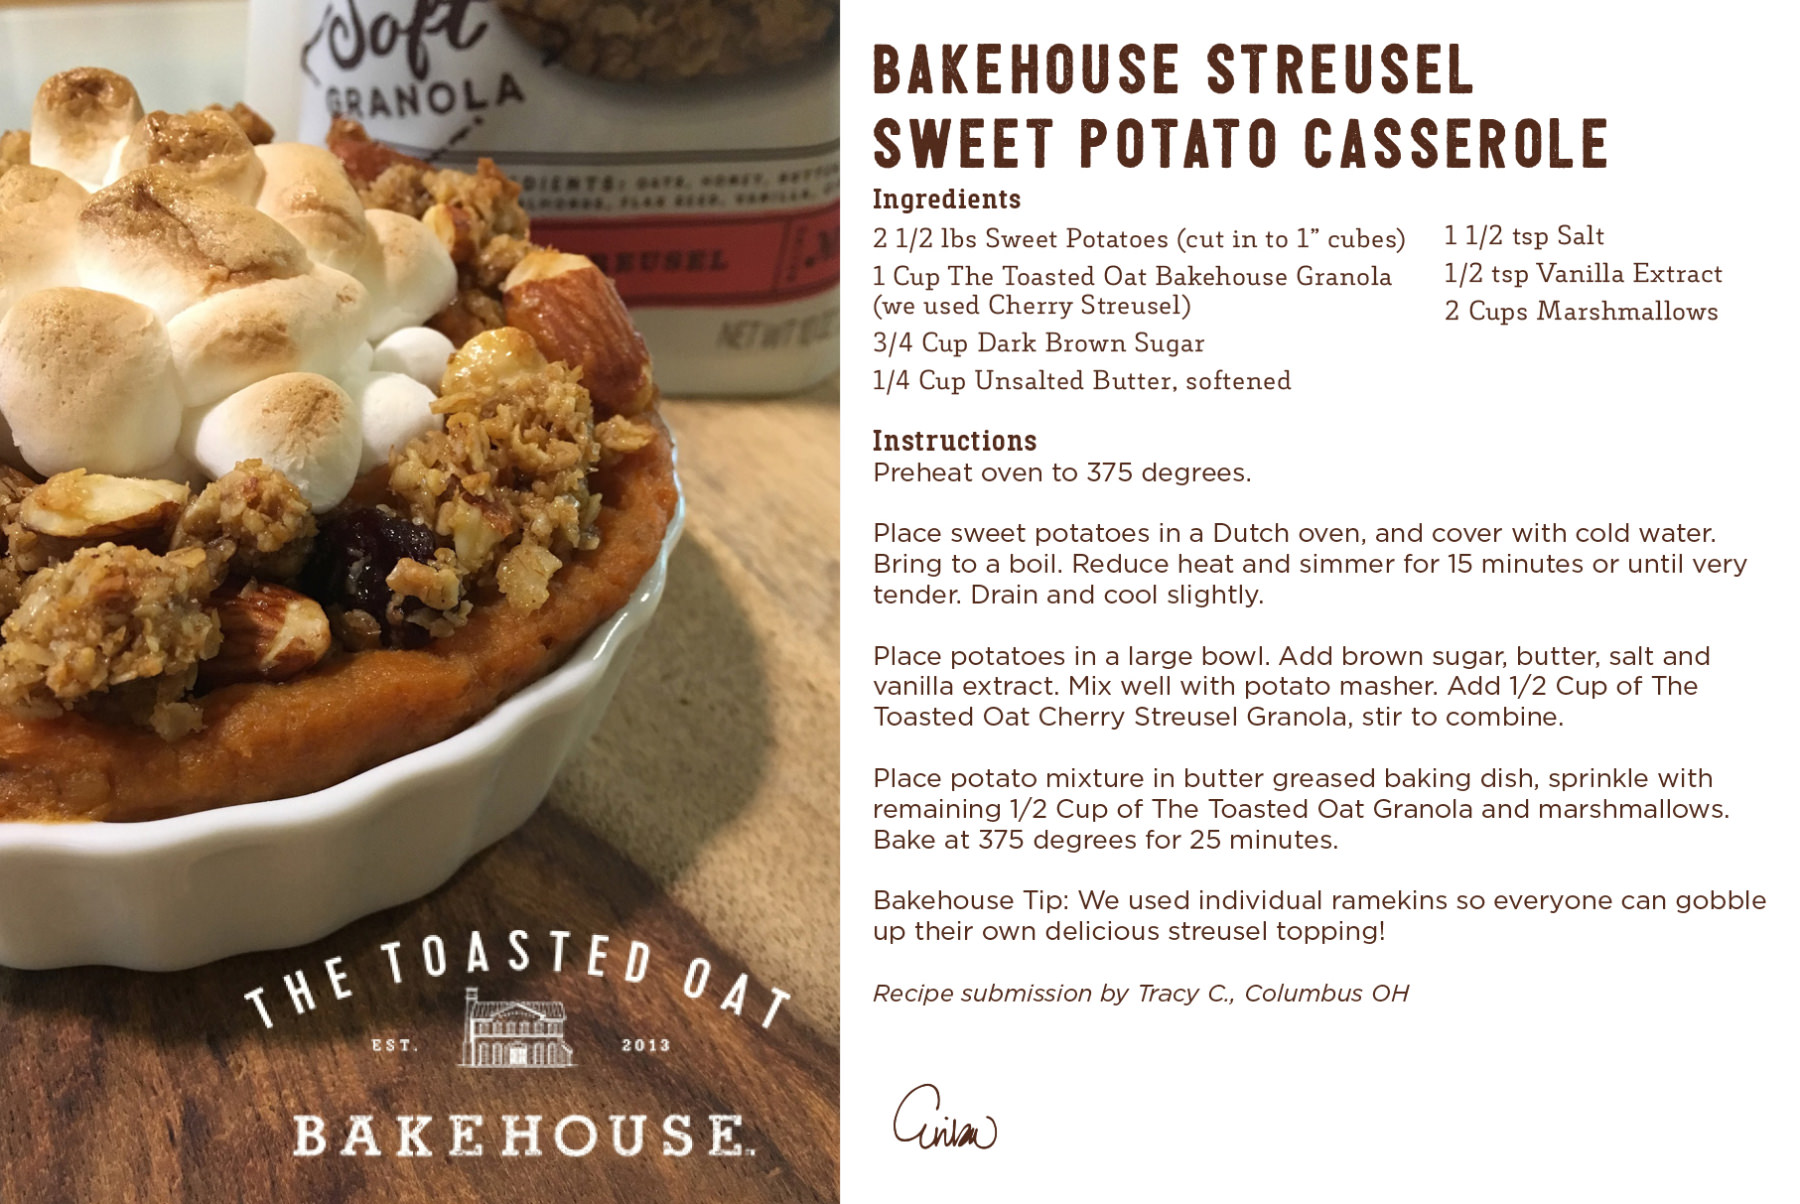 Bakehouse Streusel Sweet Potato Casserole